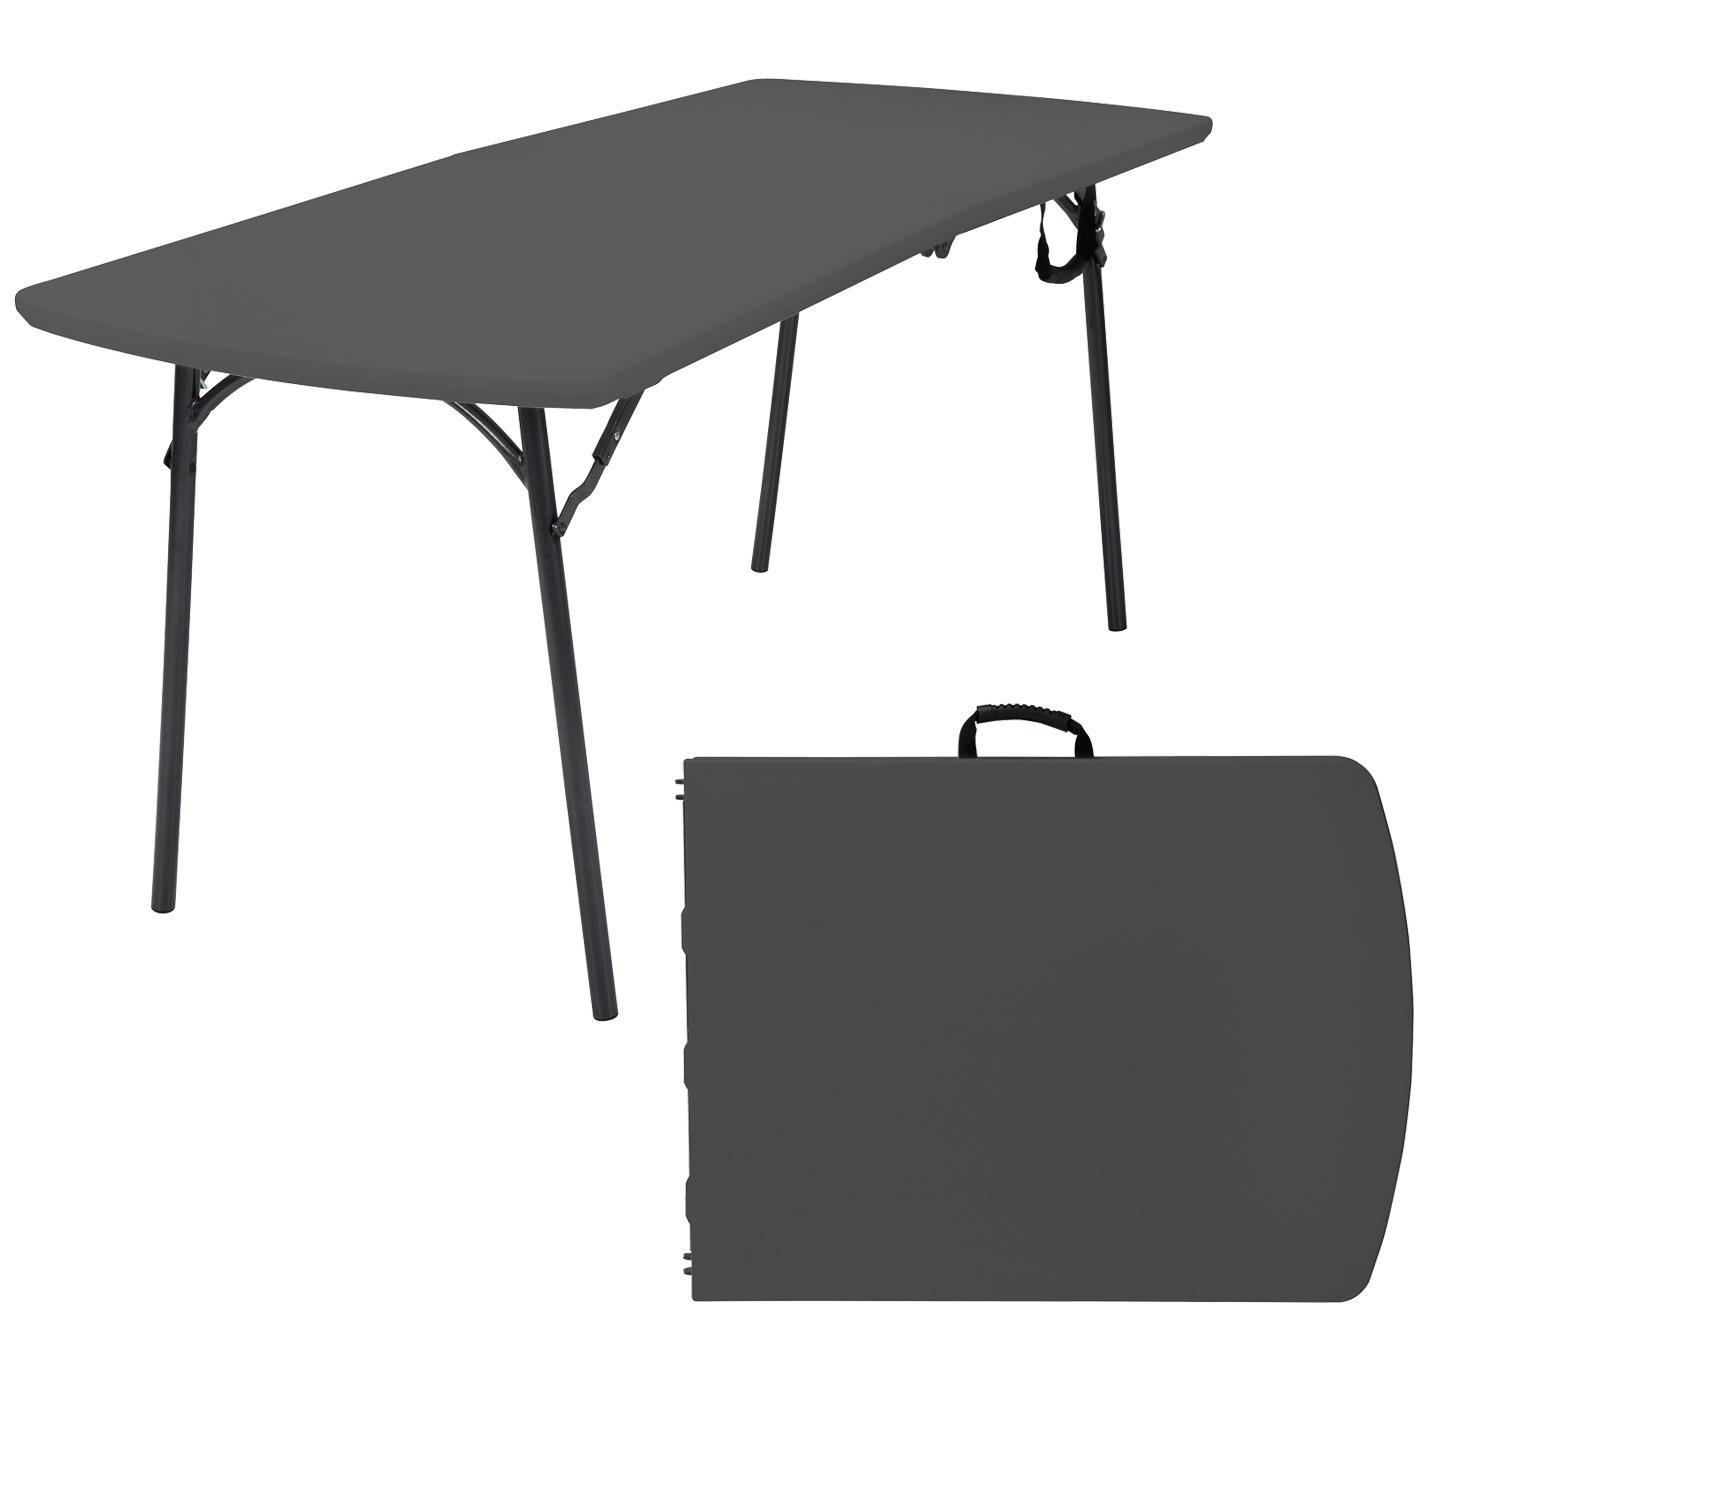 Cosco Diamond Series Banquet Folding Table, 6' X 30'', Black by Cosco